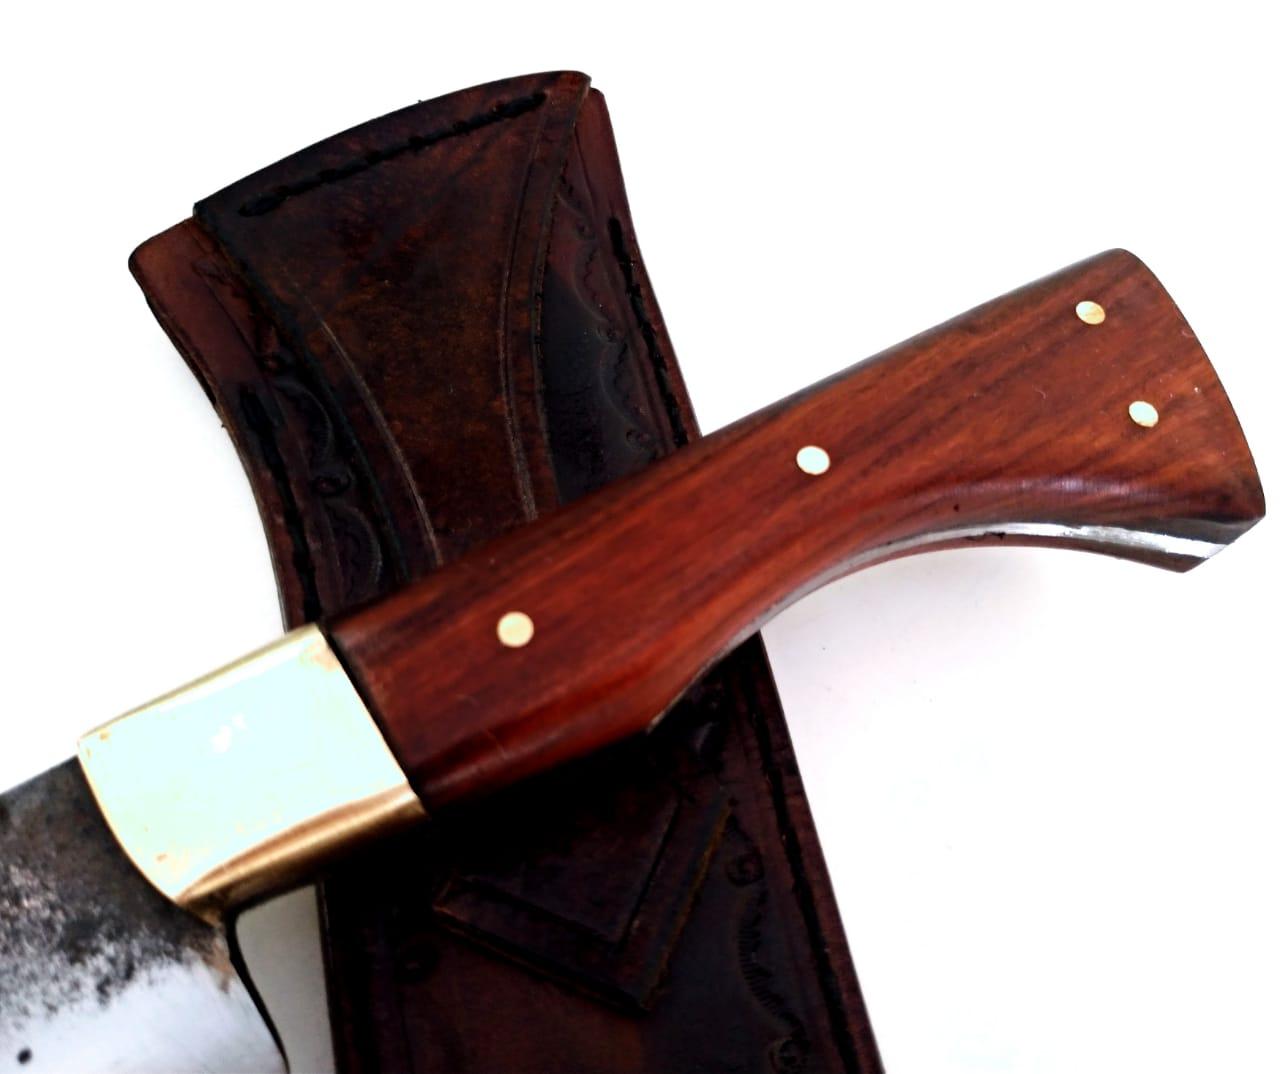 Faca artesanal tf língua de chimango aço carbono 12 polegadas